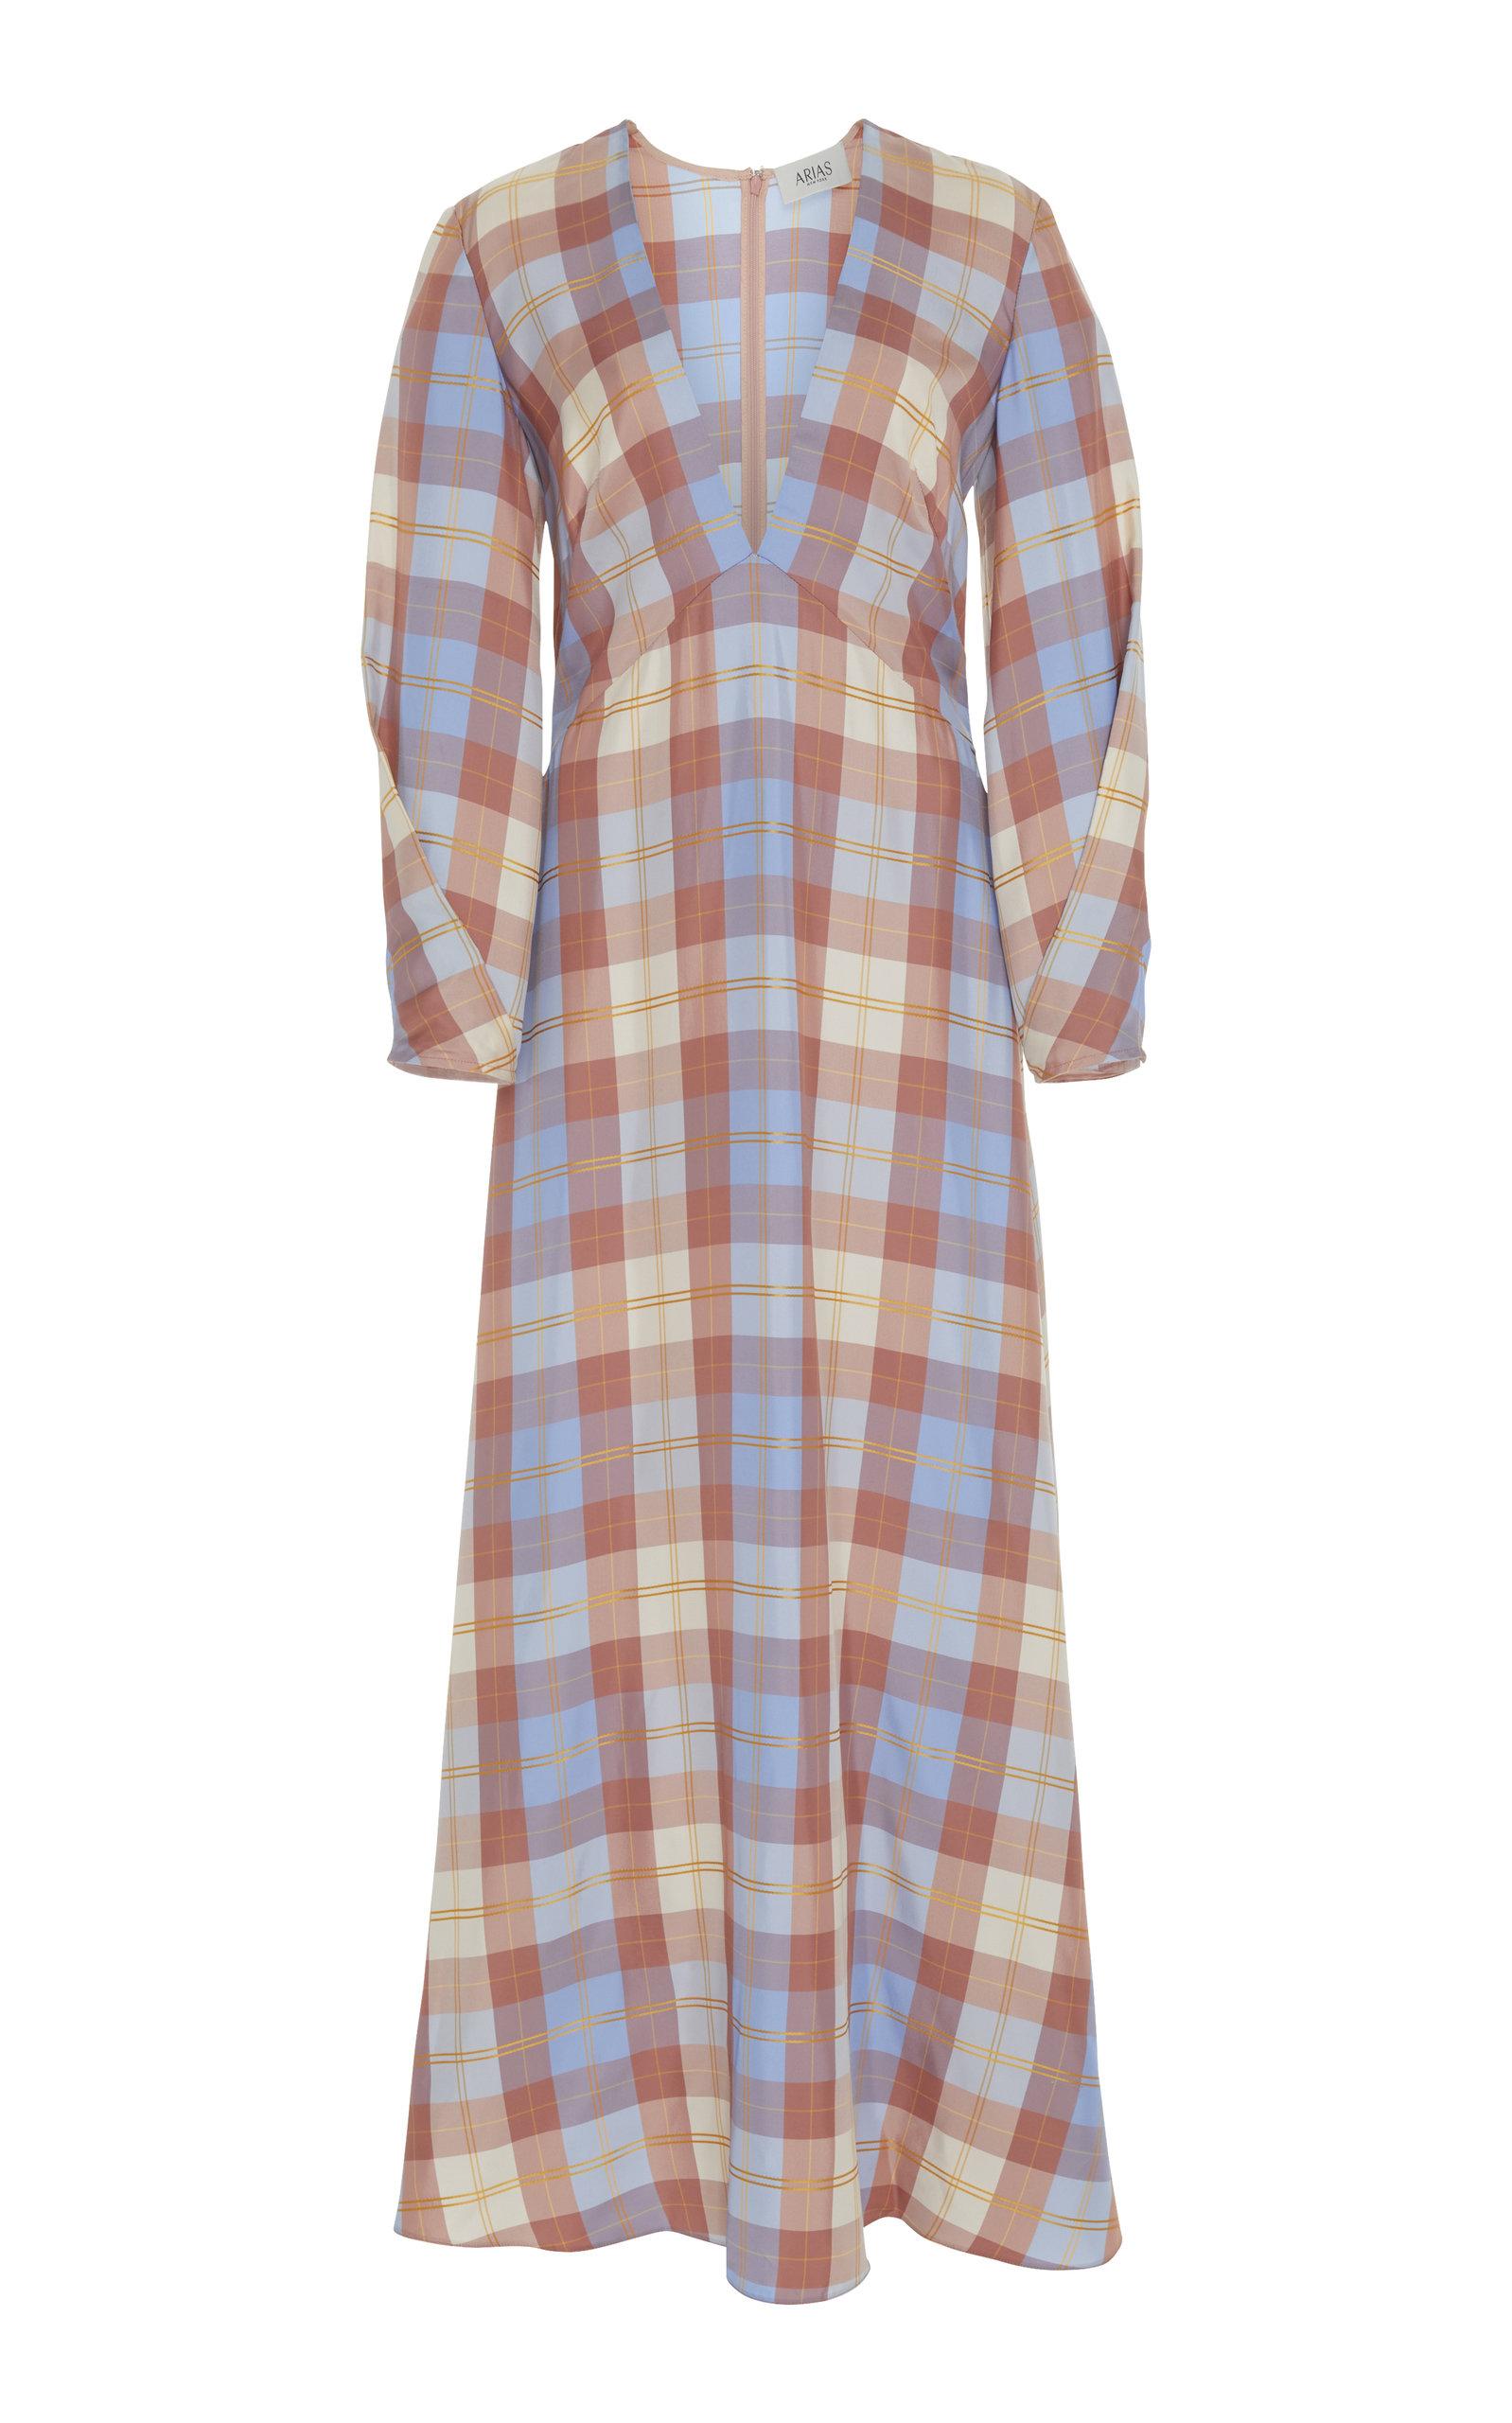 ARIAS PRINTED MAXI DRESS